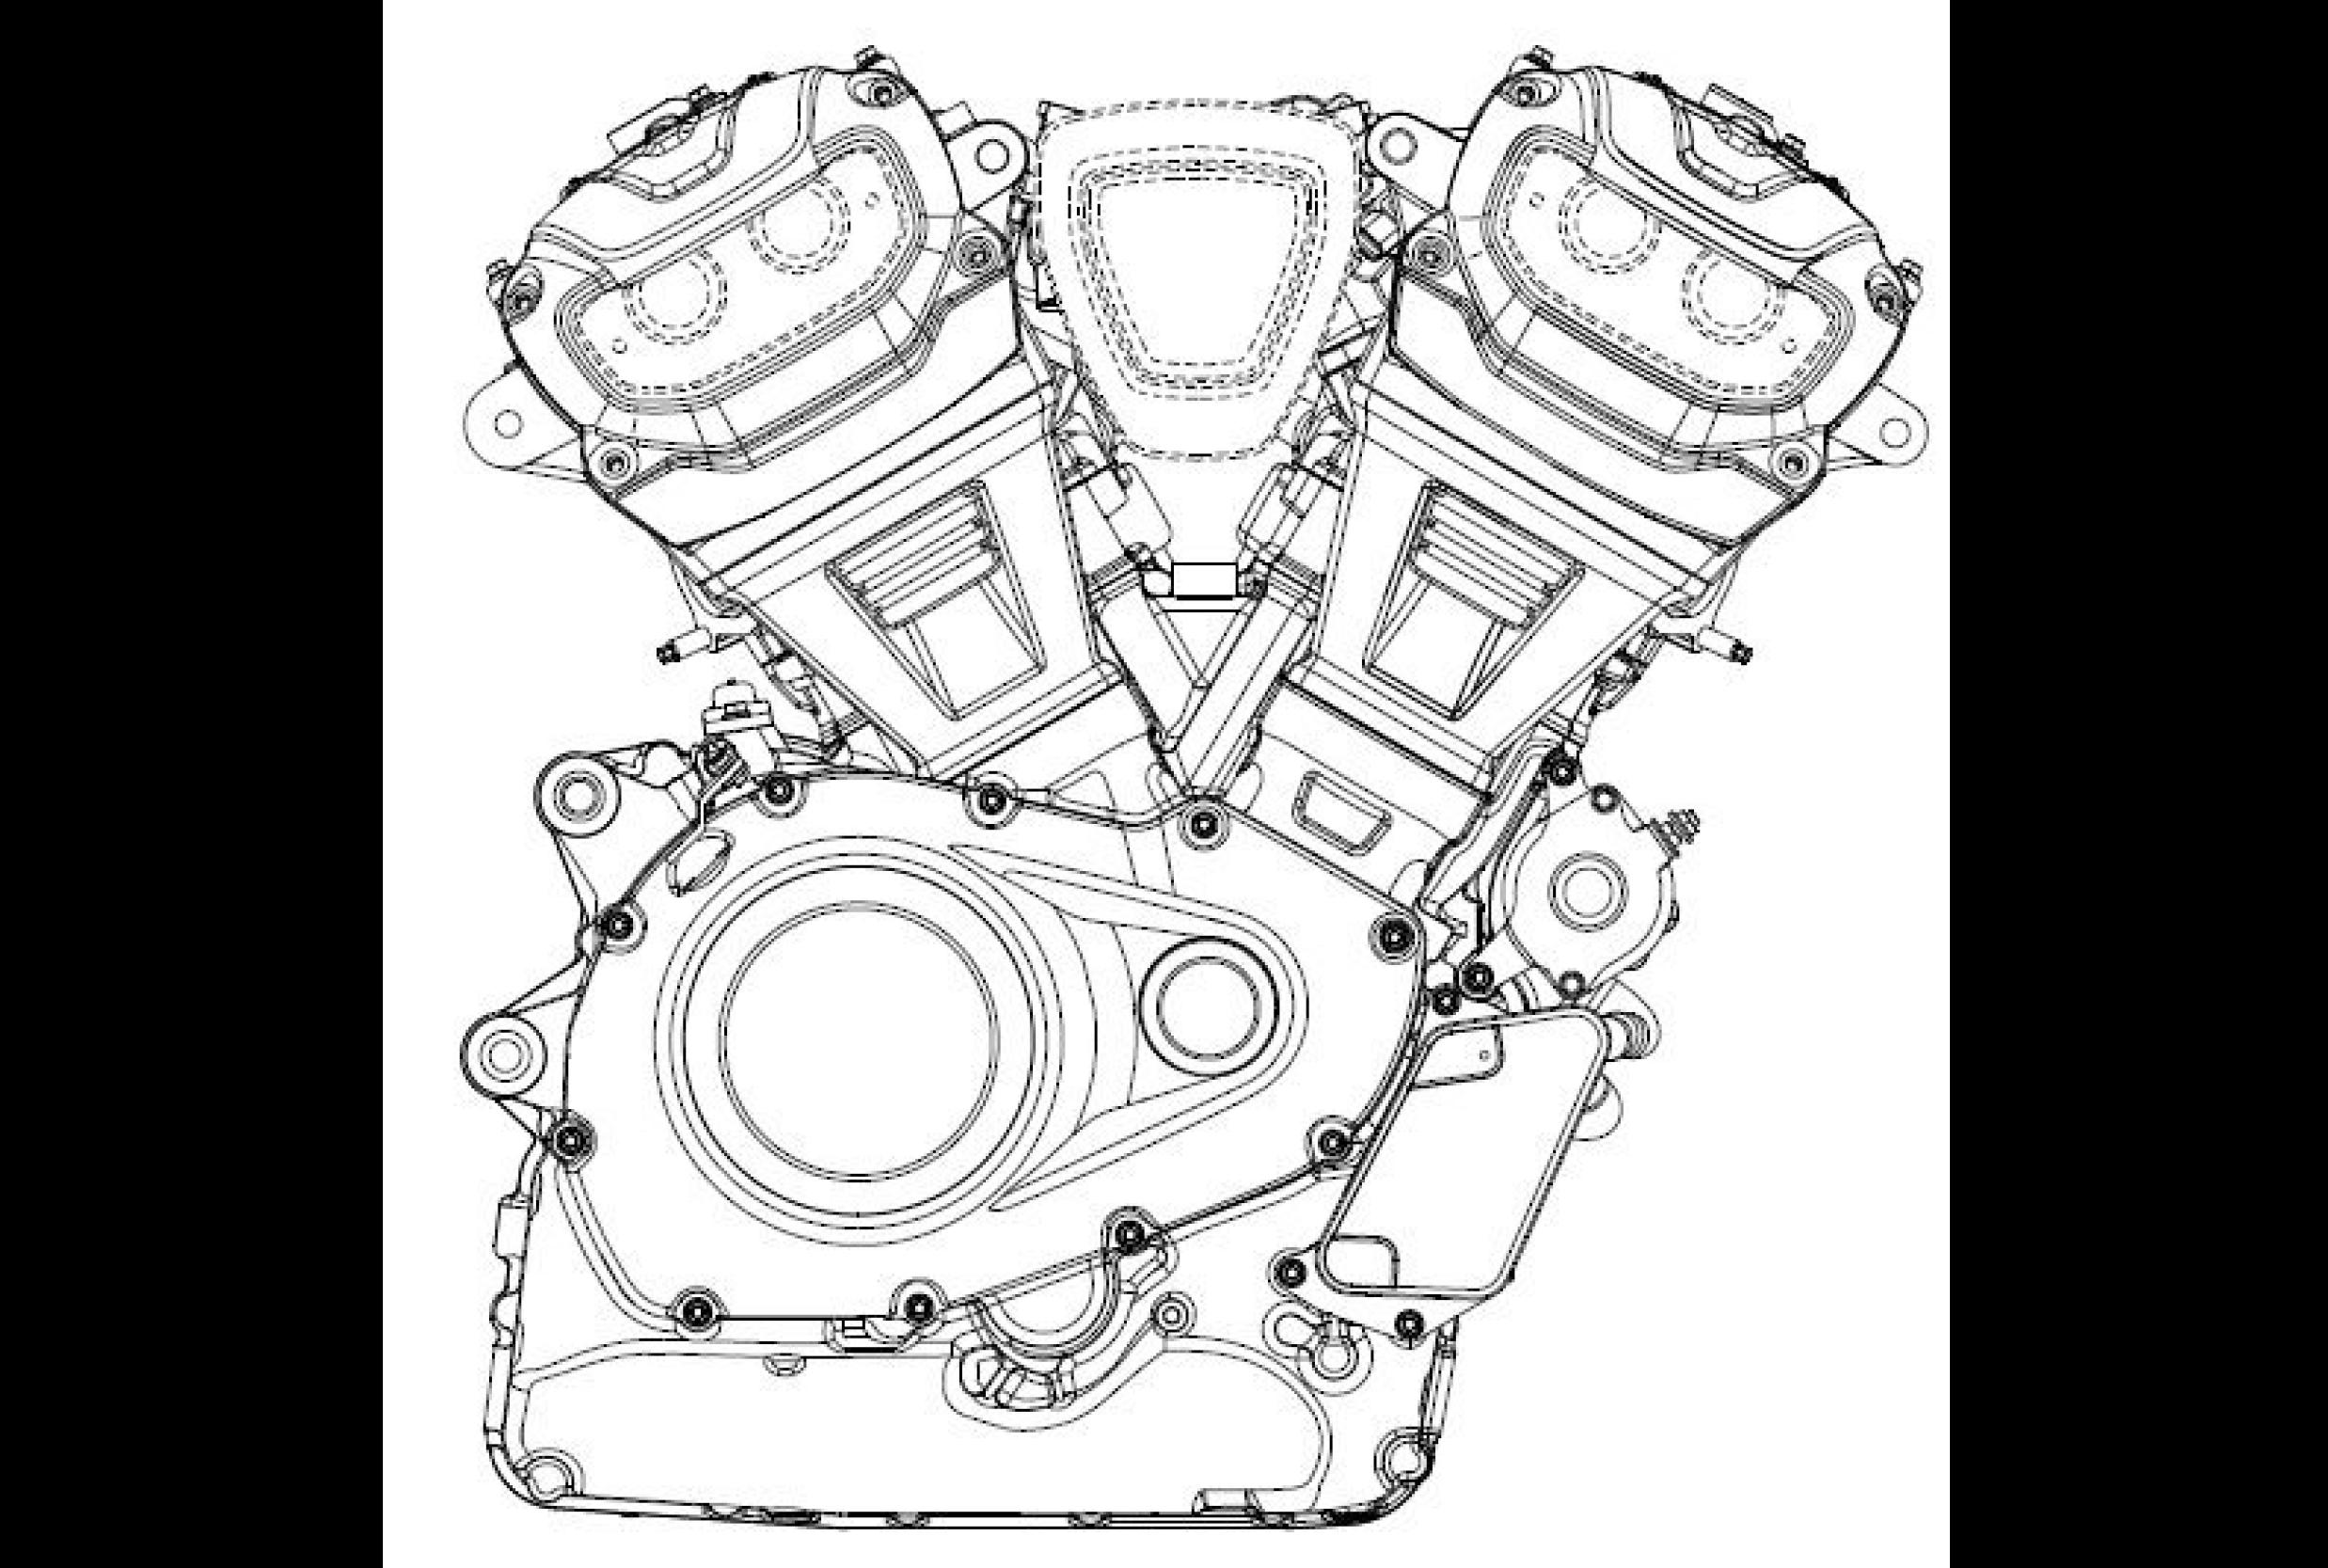 040419-harley-davidson-new-60-degree-v-twin-engine-0001-fig-3